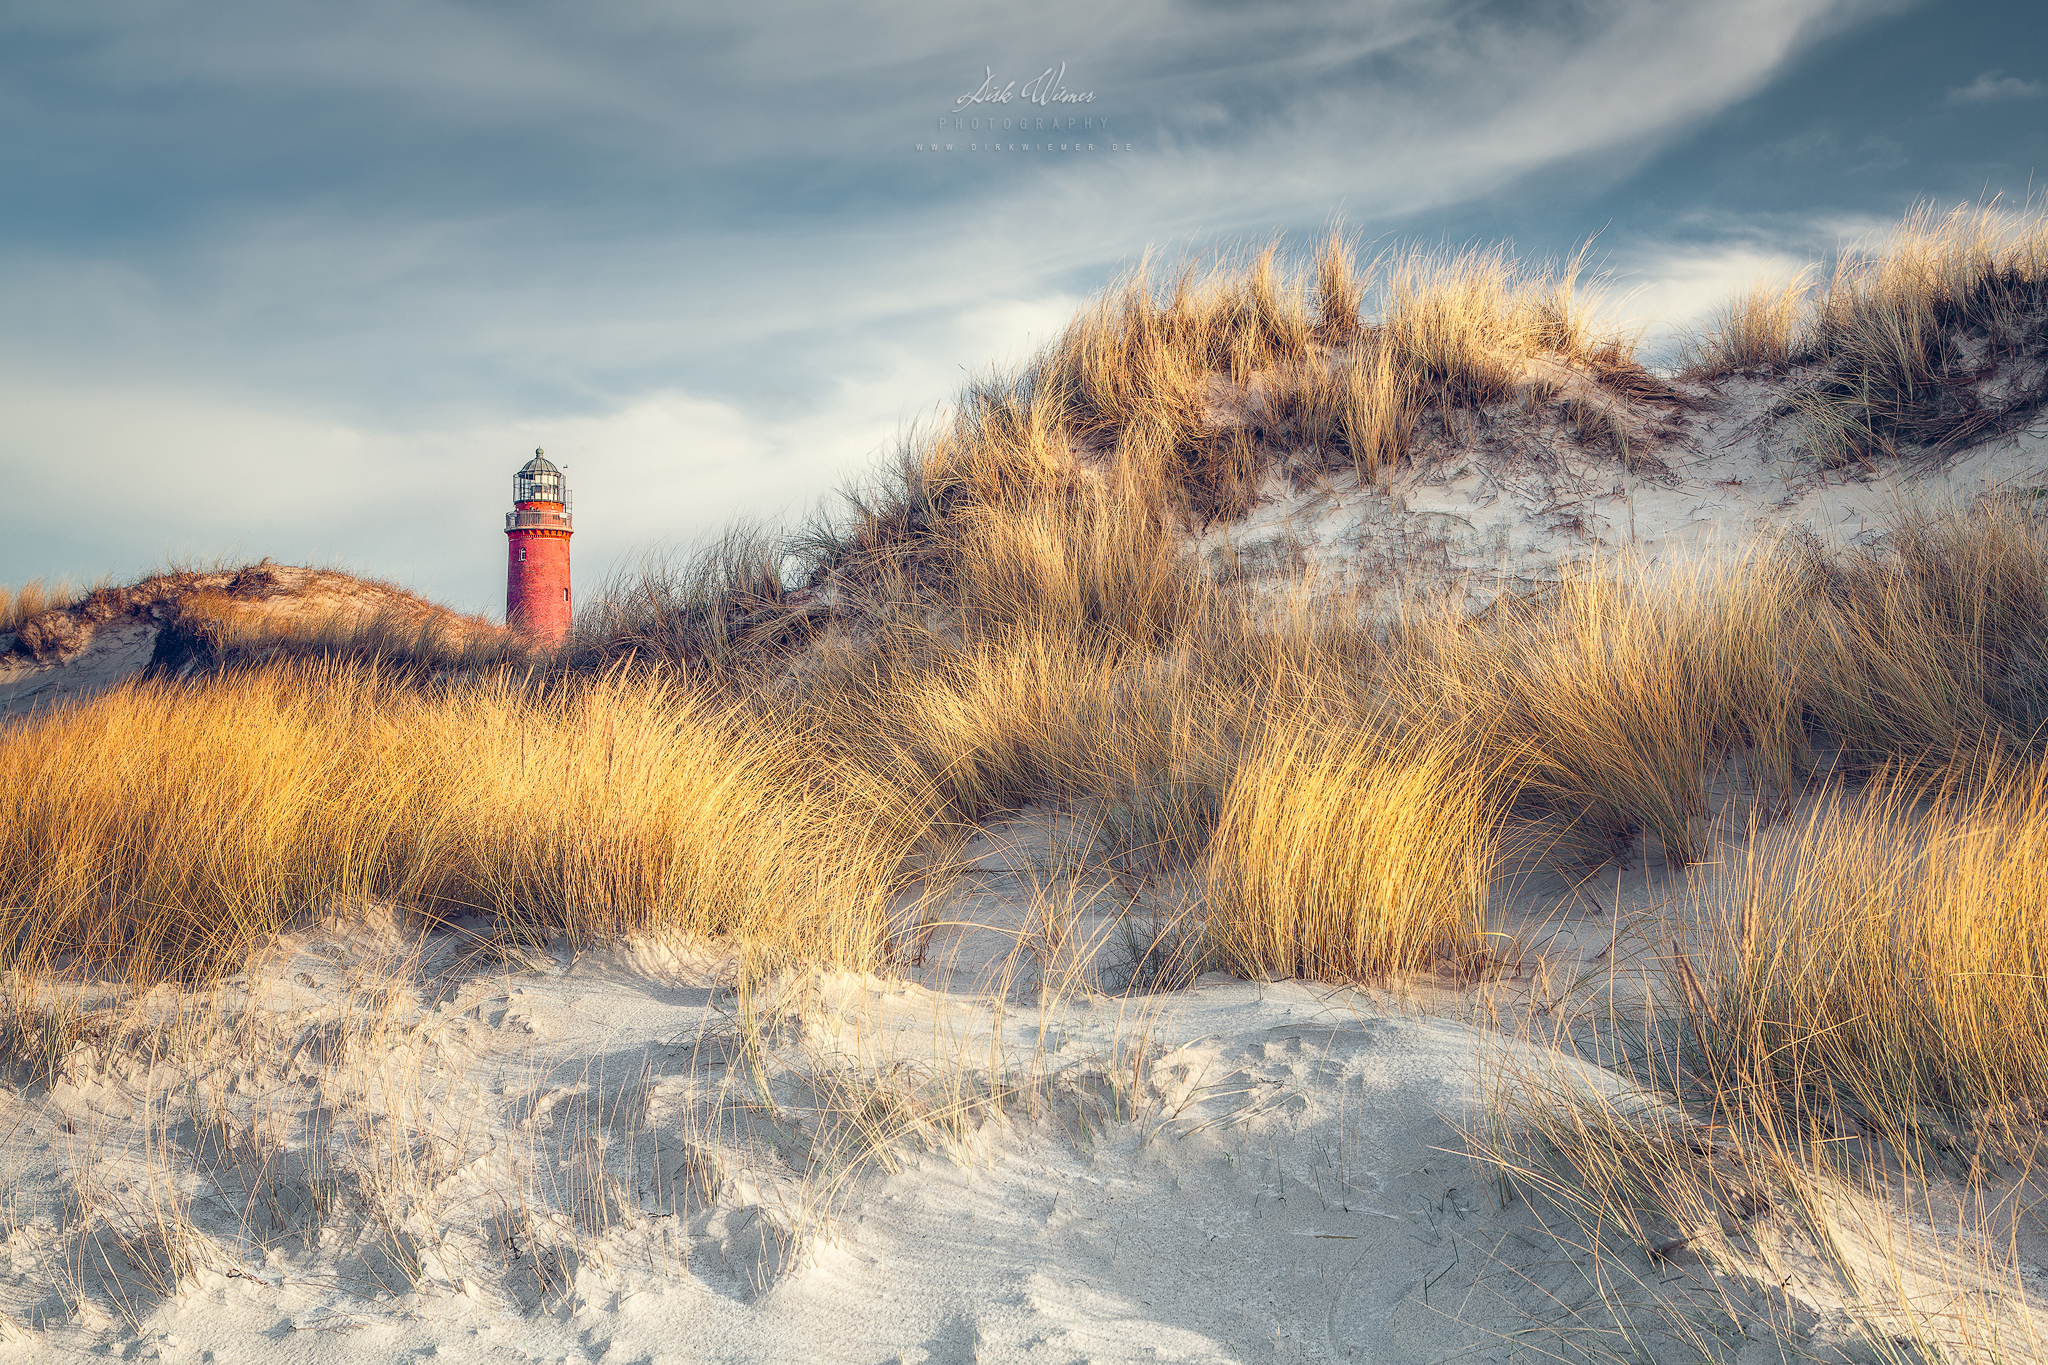 Lighthouse Darßer Ort, Germany